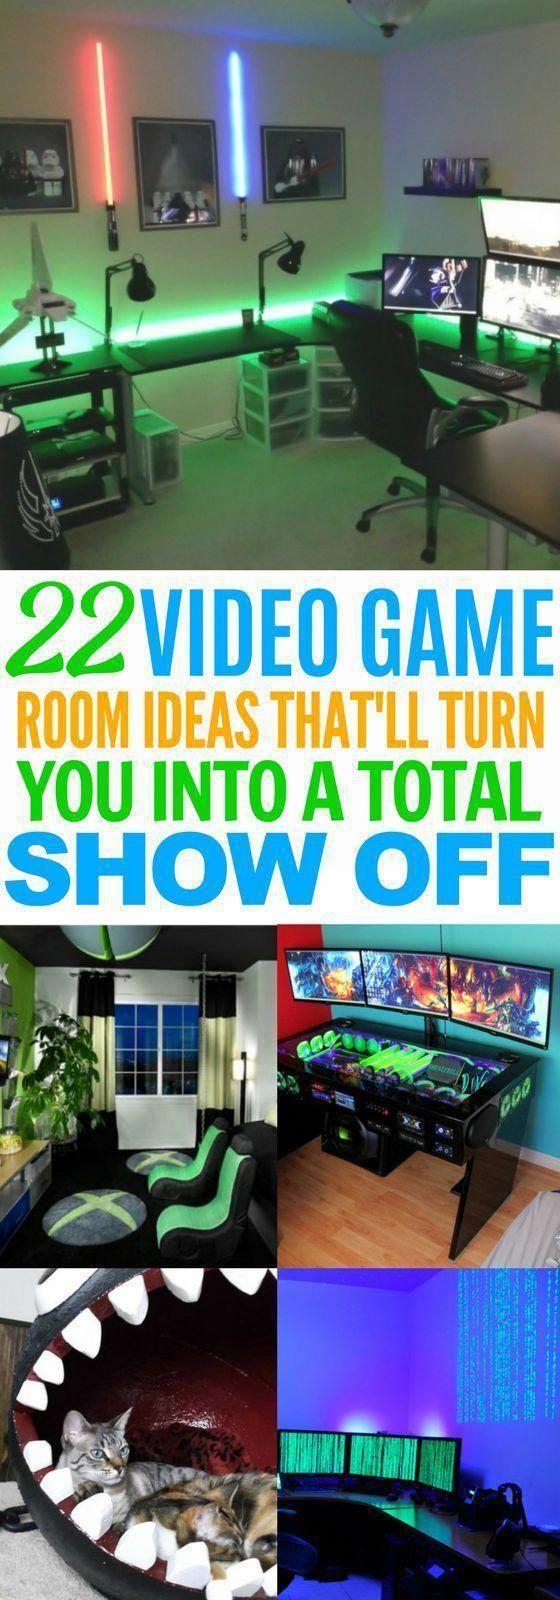 small conference room design ideas #Smallroomdesign #gameroomdecorideassmall